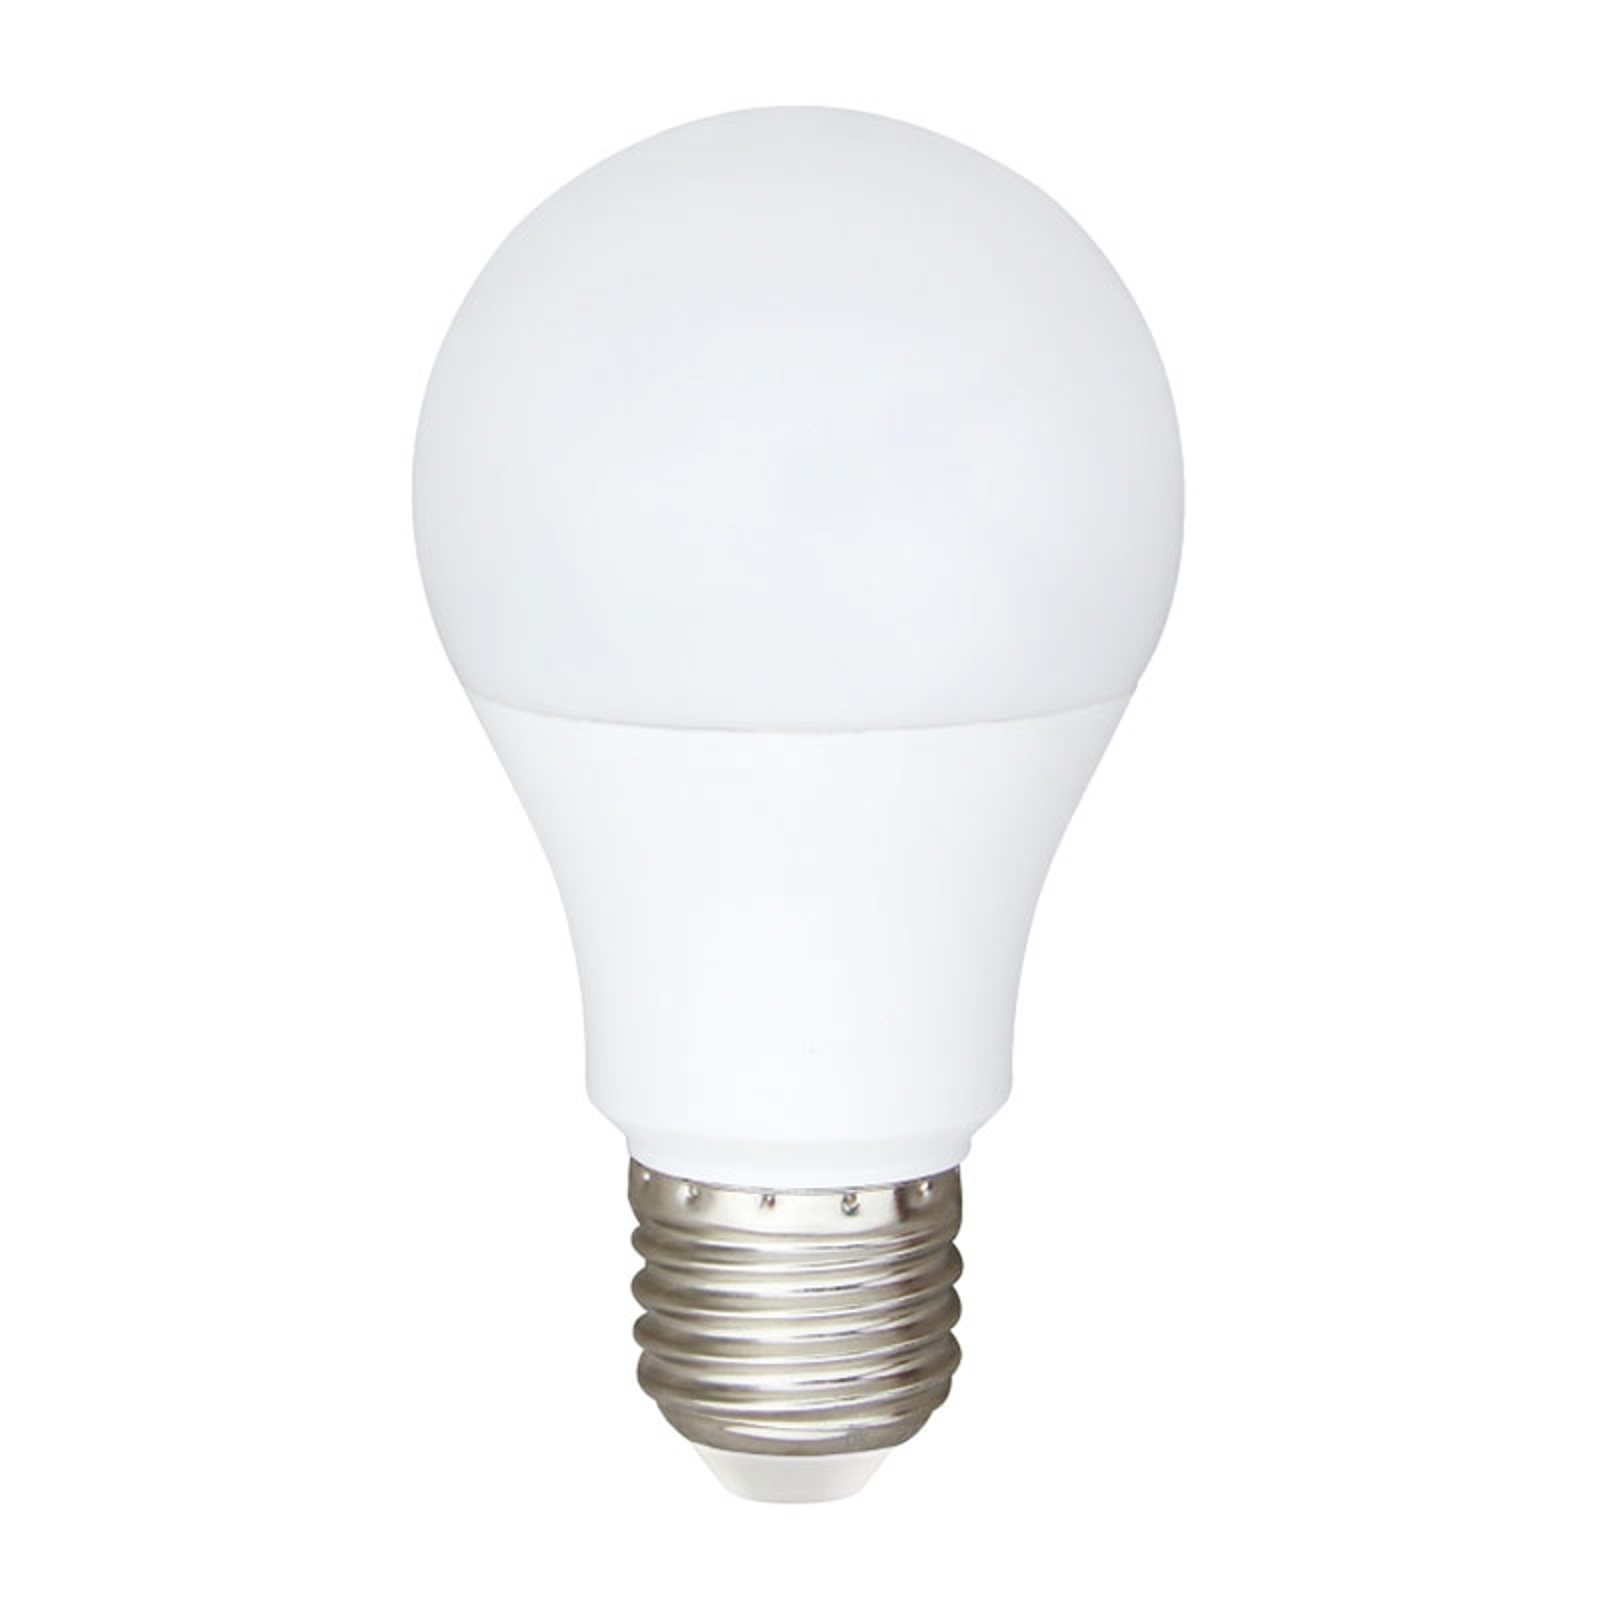 LED-Lampe ARAXA E27 9W für AC und DC, 5.000K